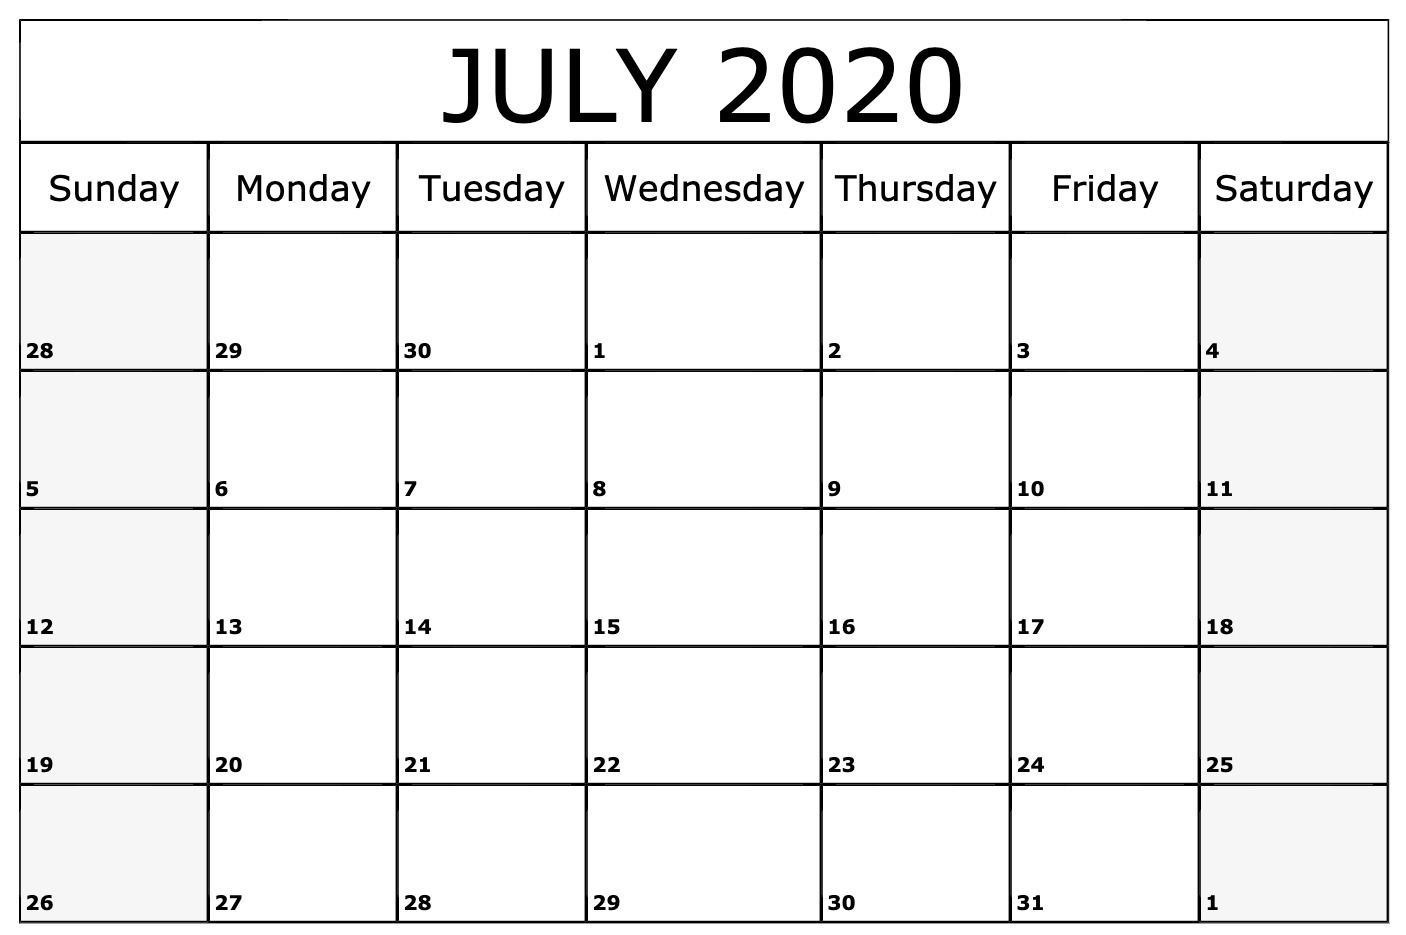 Free Blank July 2020 Calendar